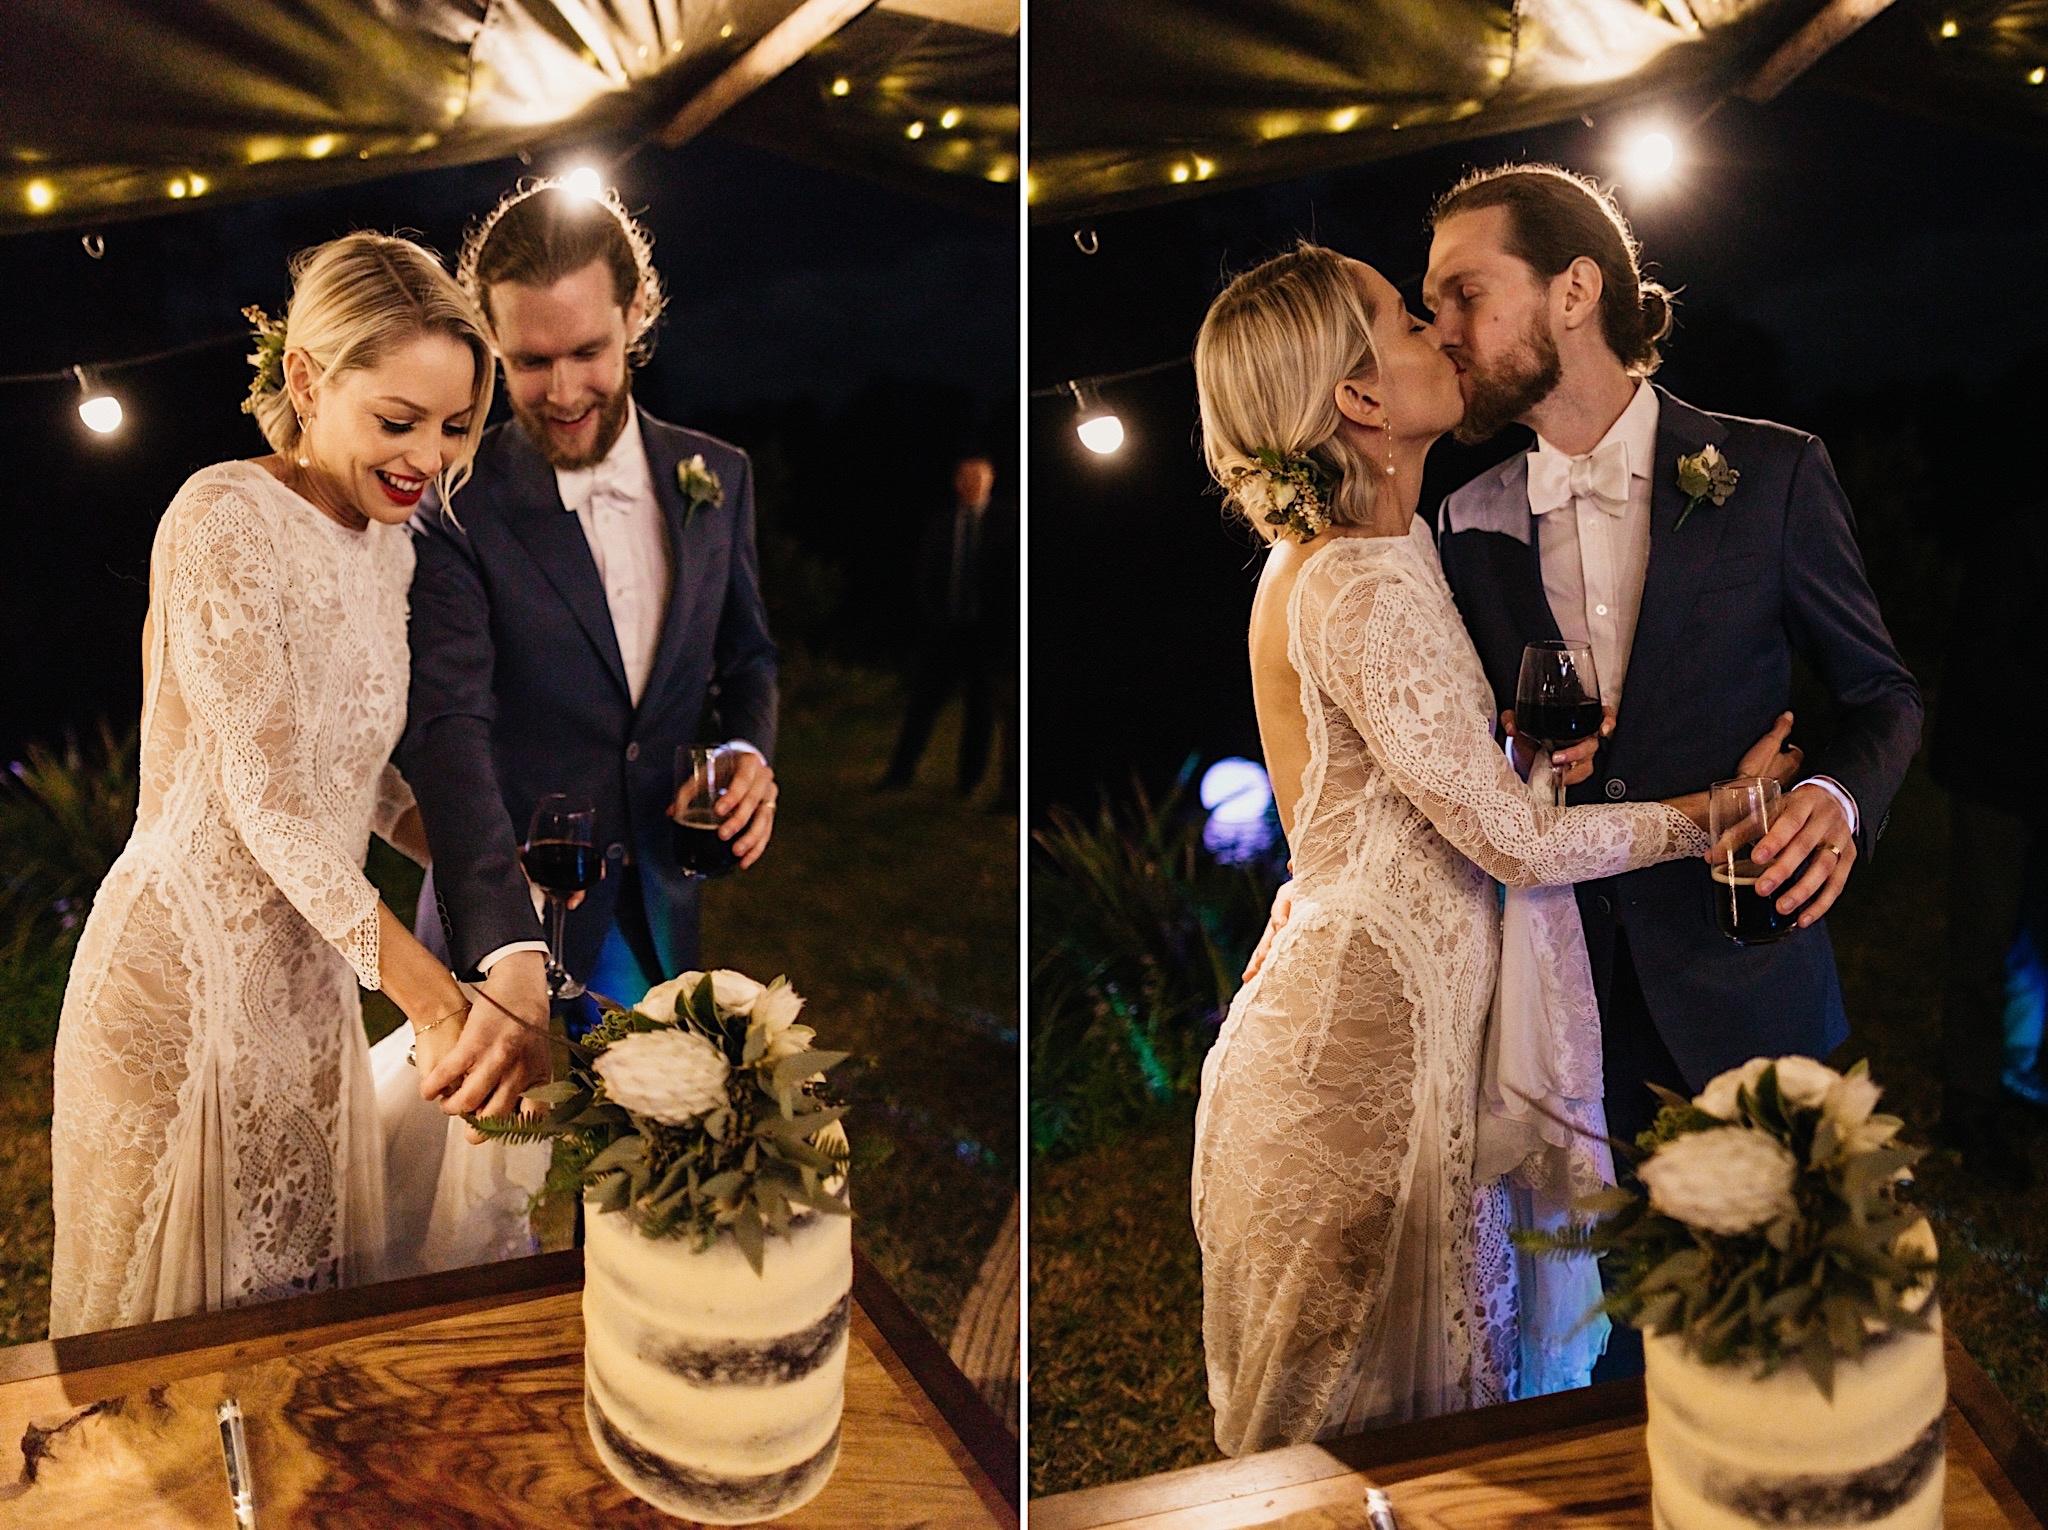 119_SBA-Jen-Tom-Wedding-497_SBA-Jen-Tom-Wedding-495.jpg